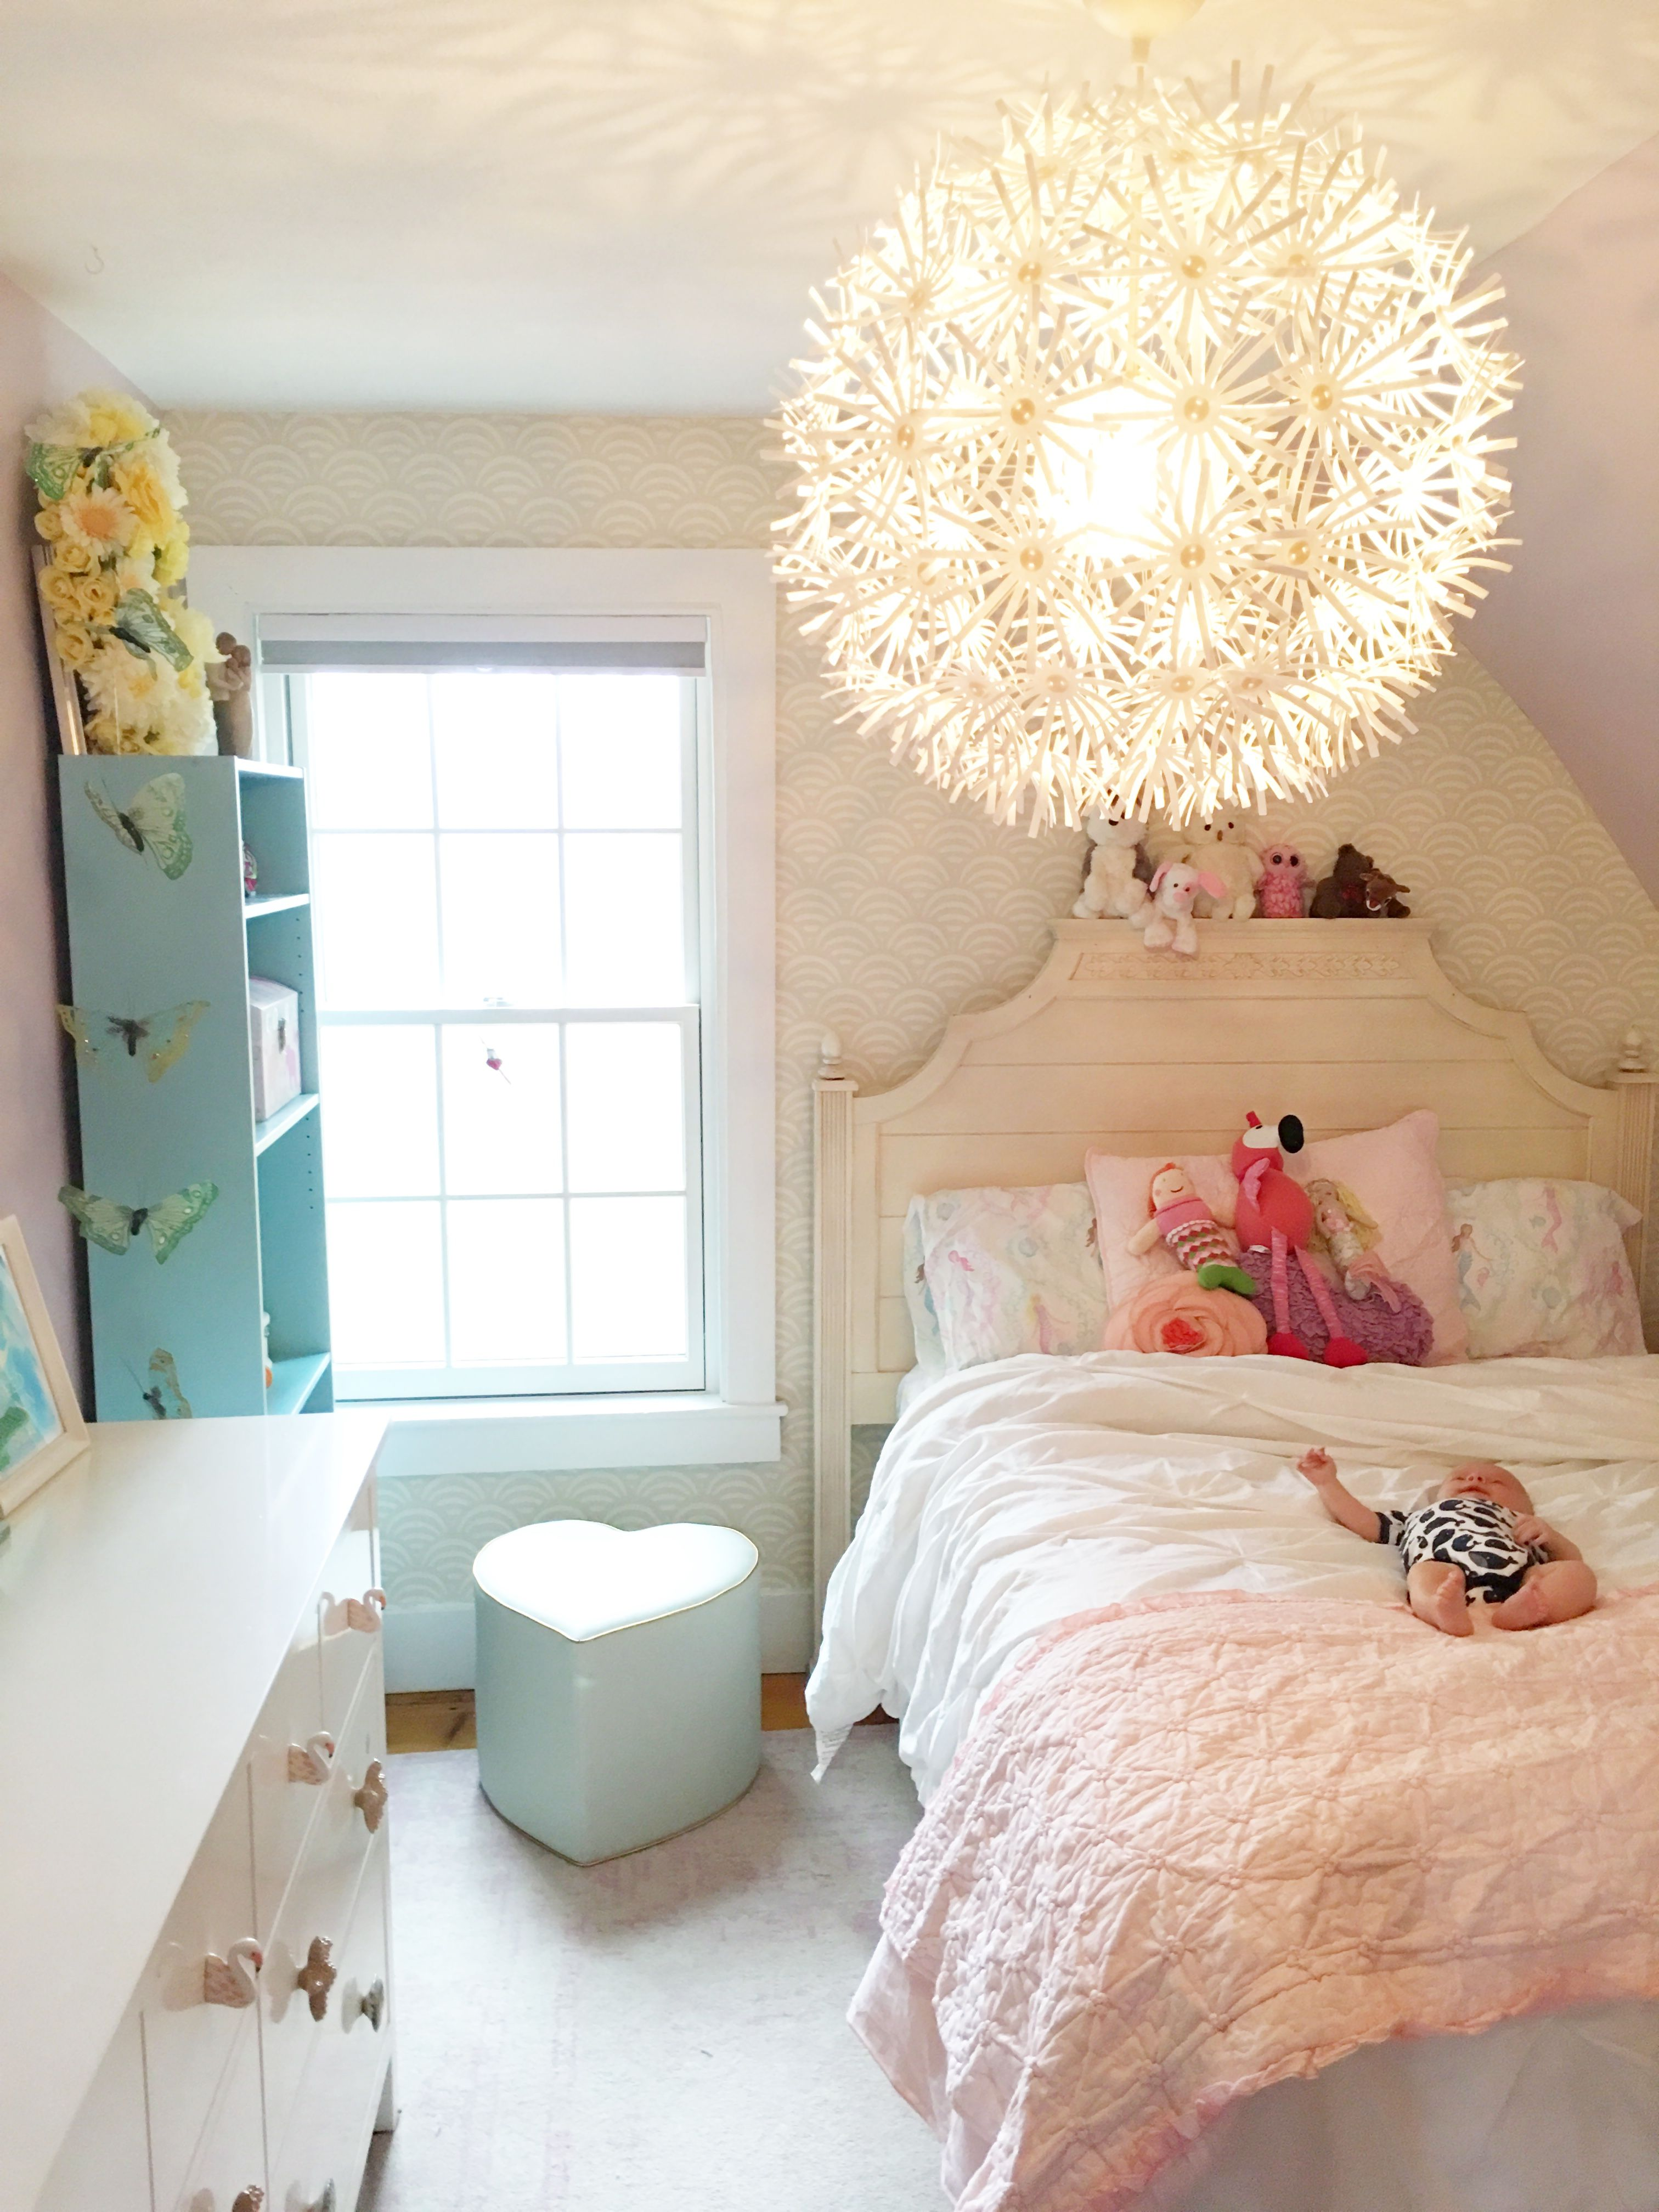 pinsarah mcgillicuddy on little girl's mermaid room